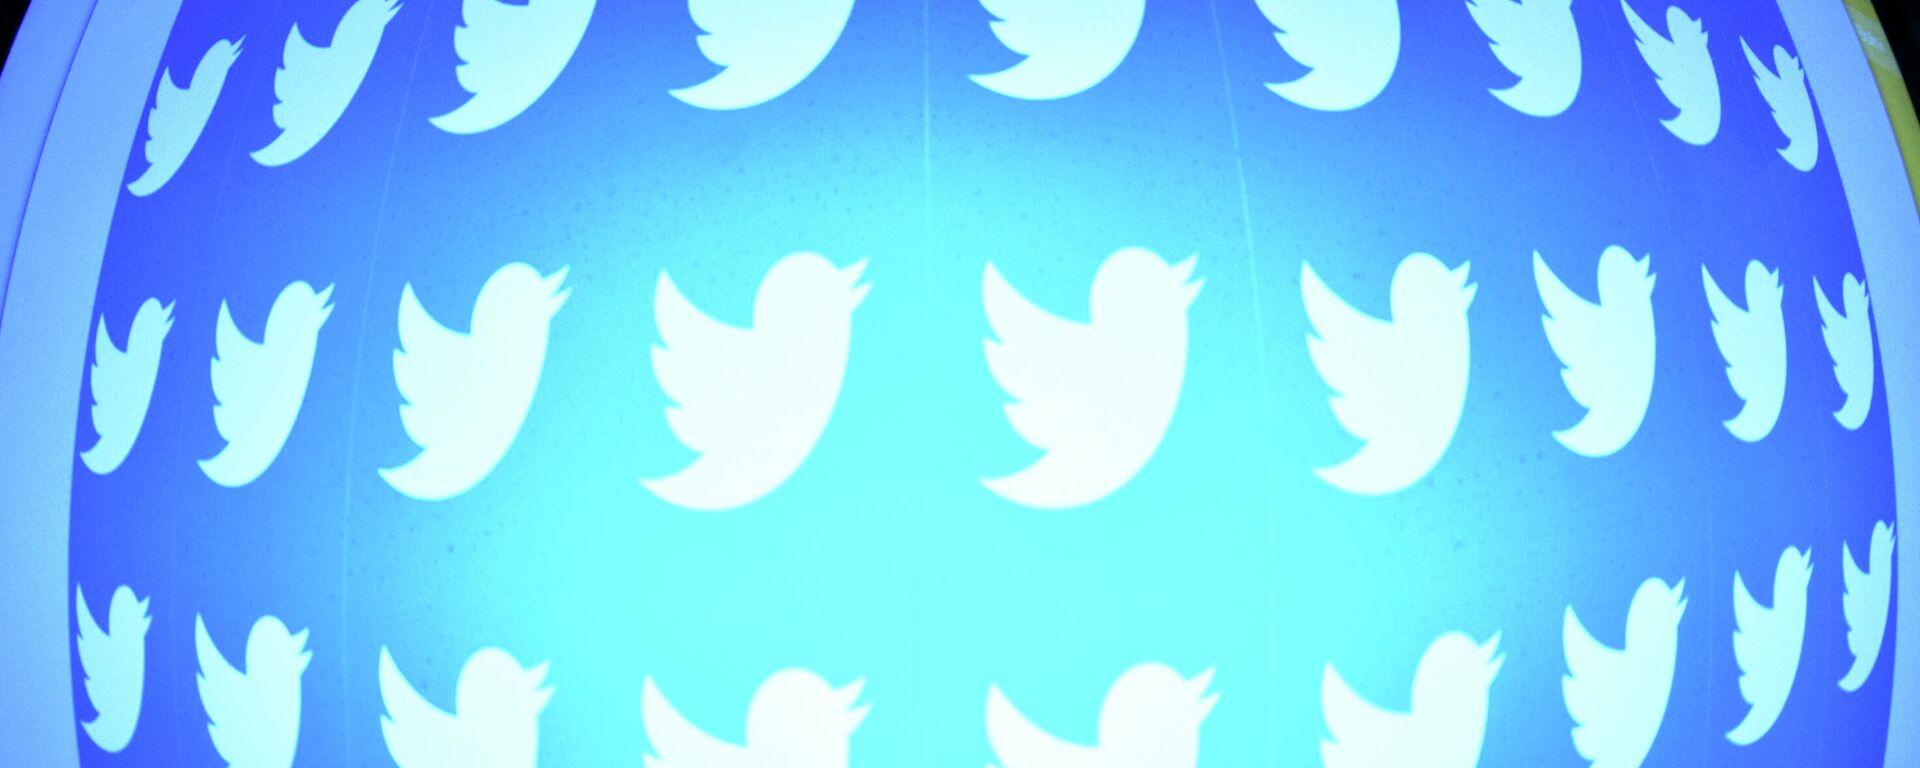 Twitter (Symbolbild) - SNA, 1920, 05.10.2021